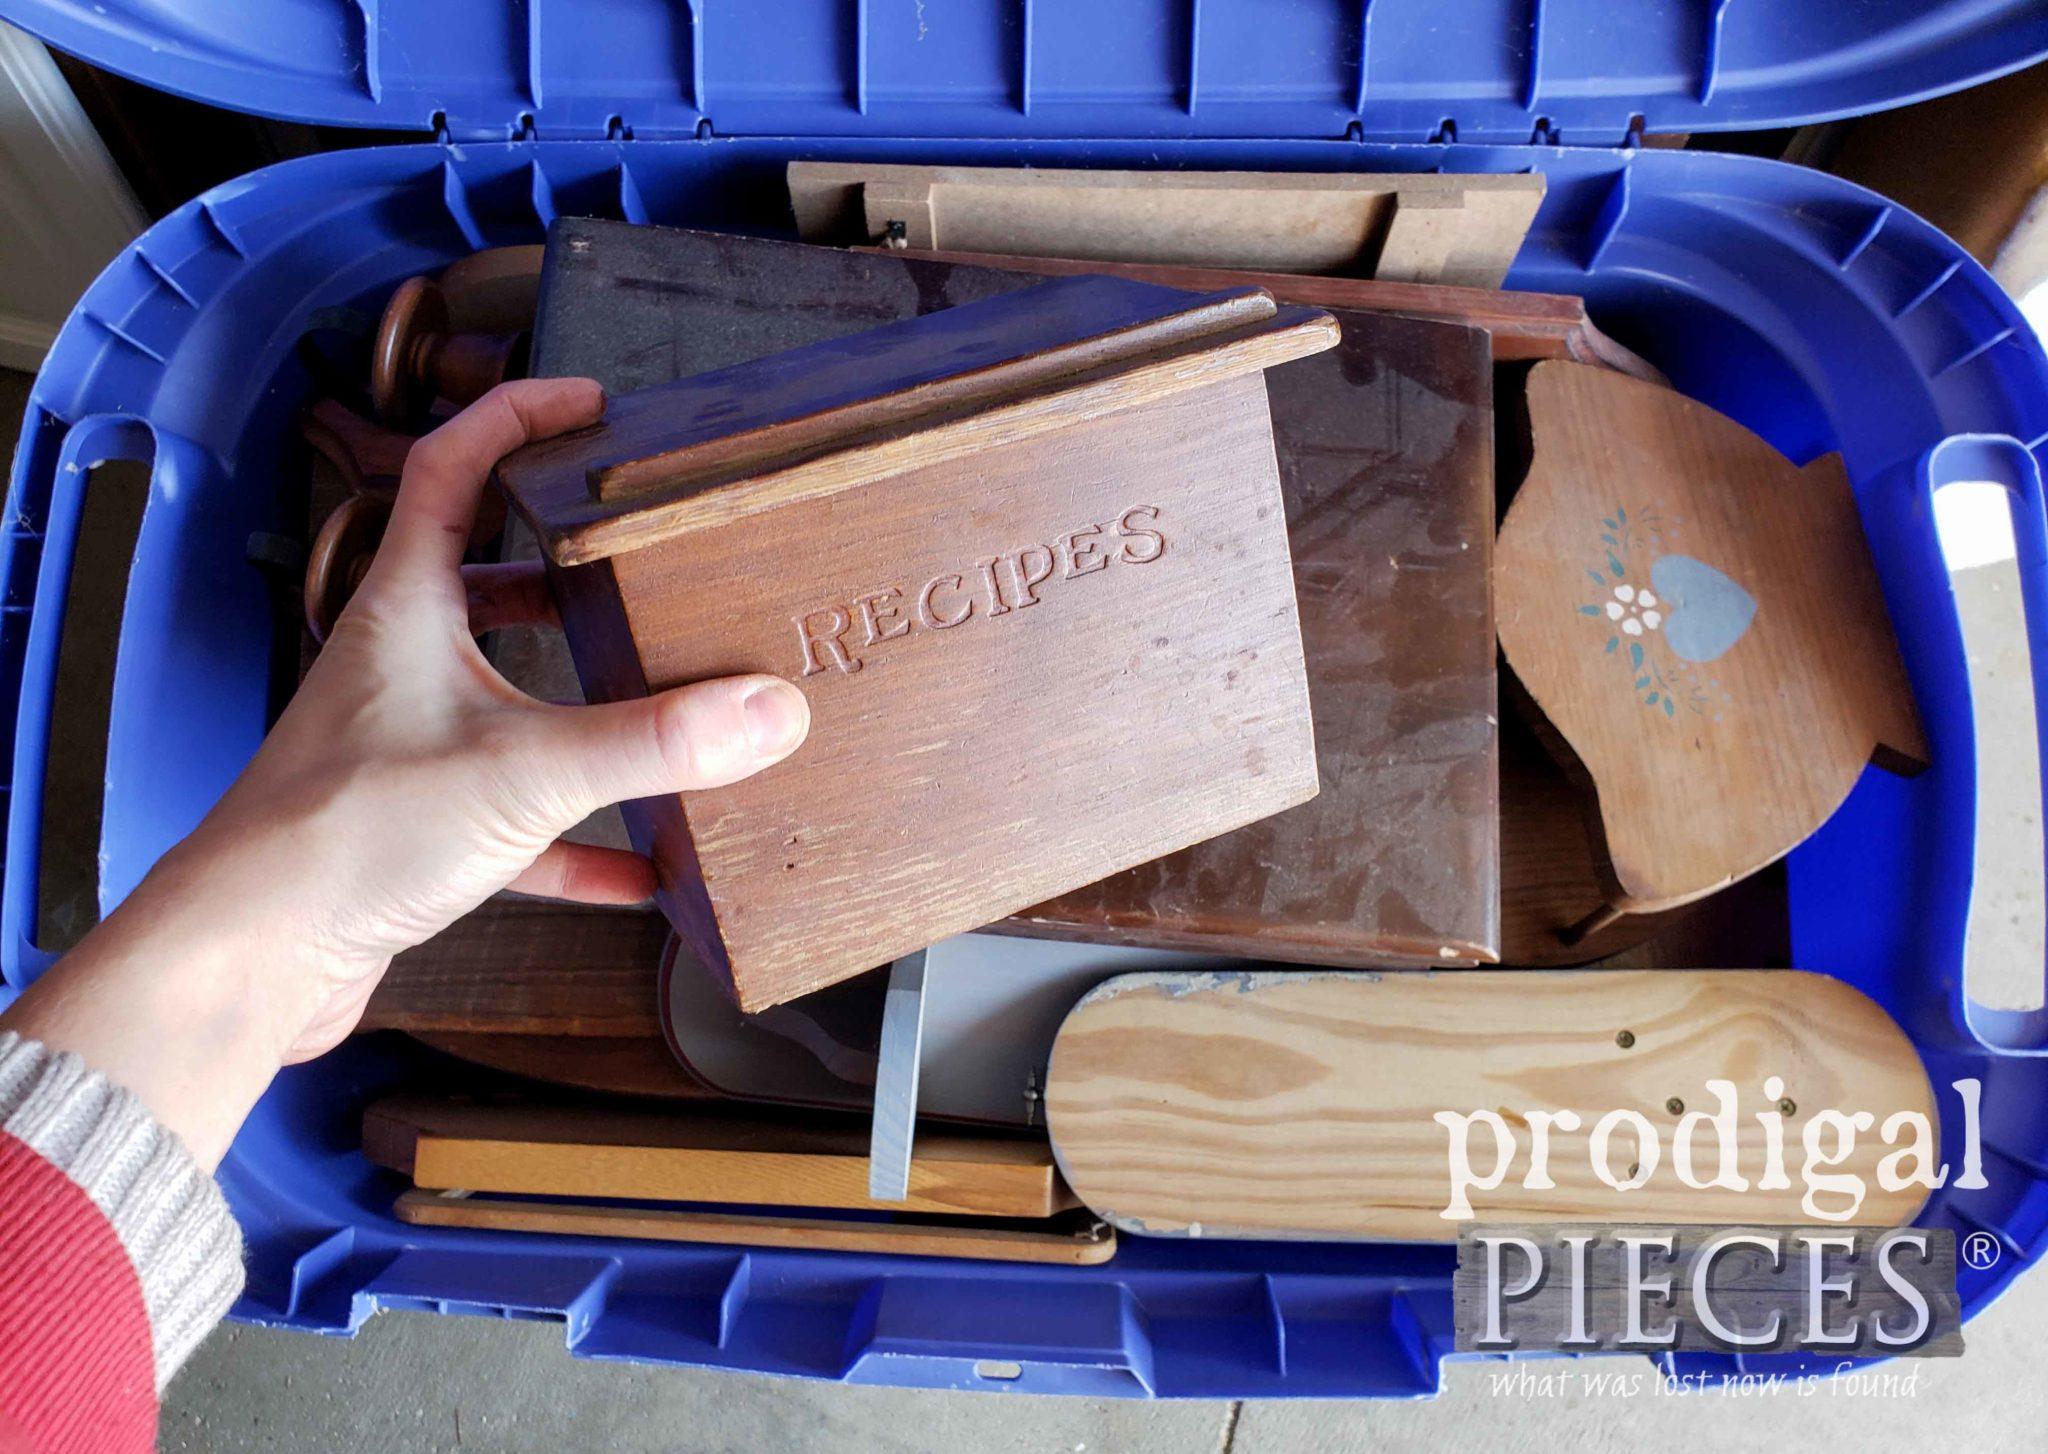 Vintage Recipe Box Before Makeover by Prodigal Pieces | prodigalpieces.com